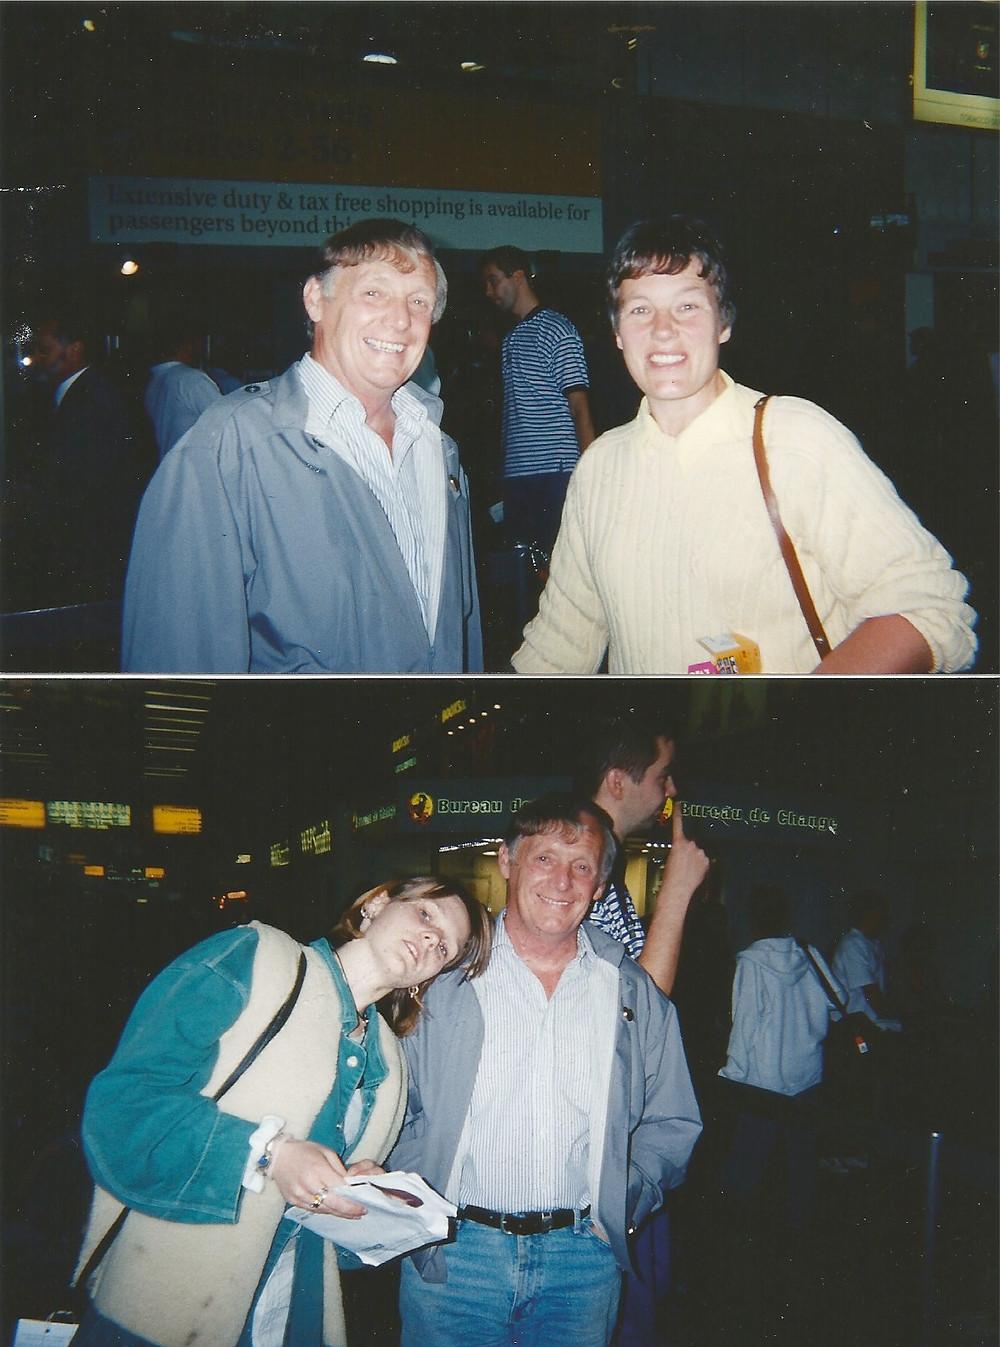 Haha! Look at us :-D October 1998